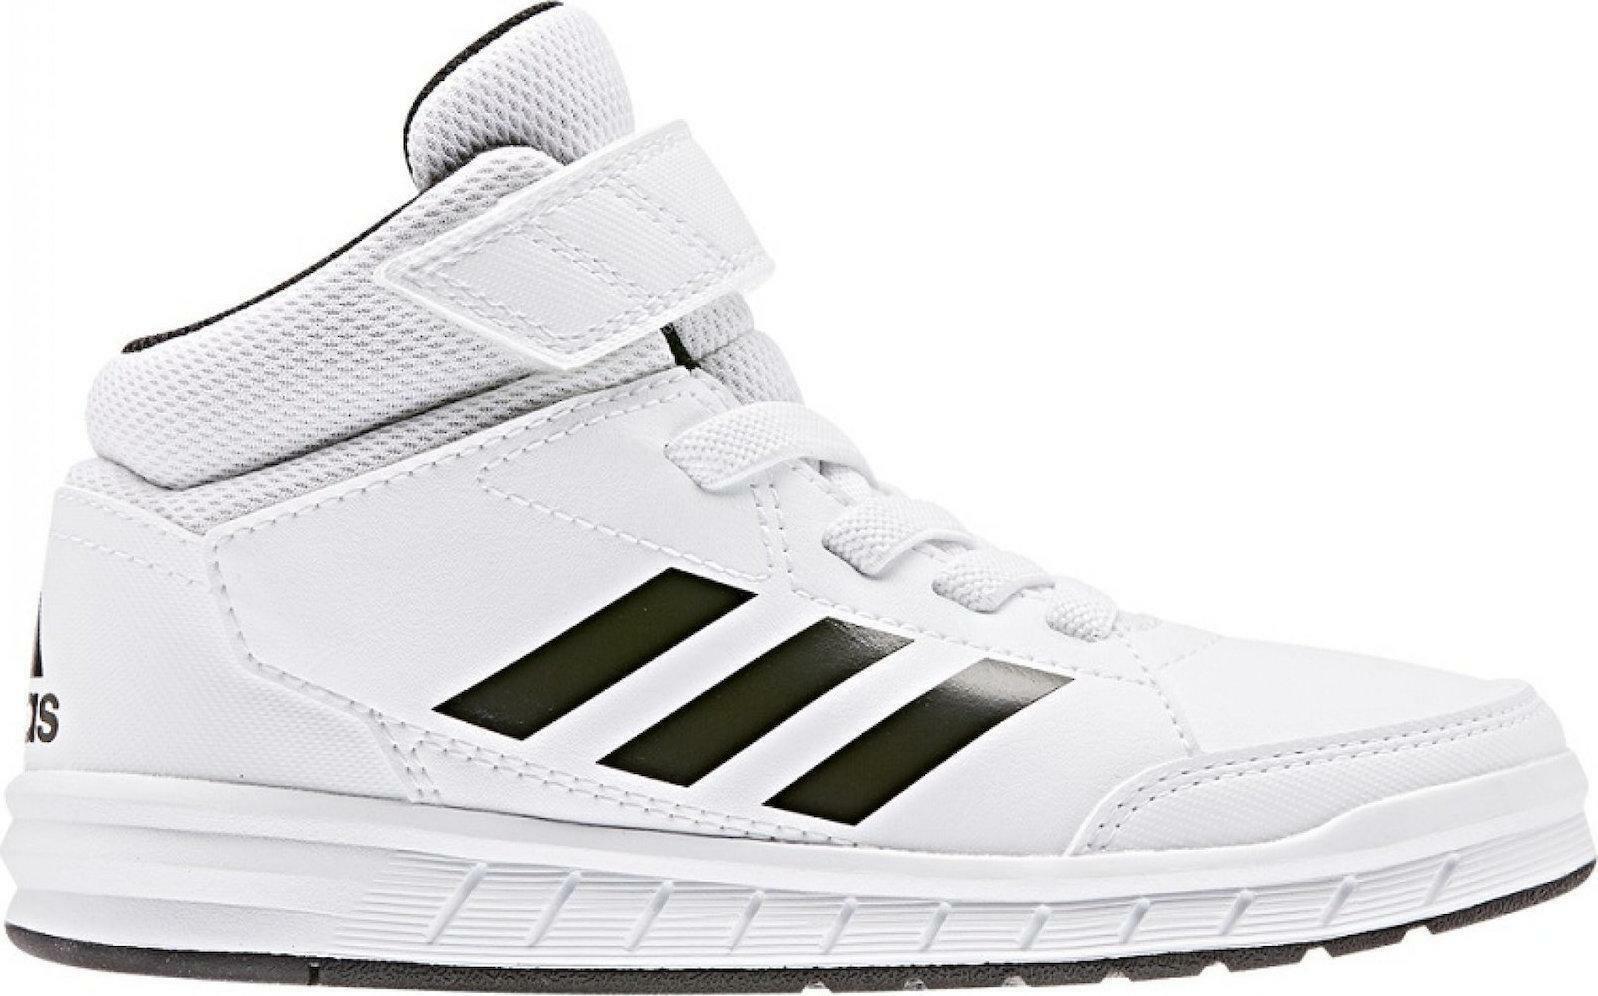 adidas adidas altasport mid k bambino sneaker alta g27114 bianco